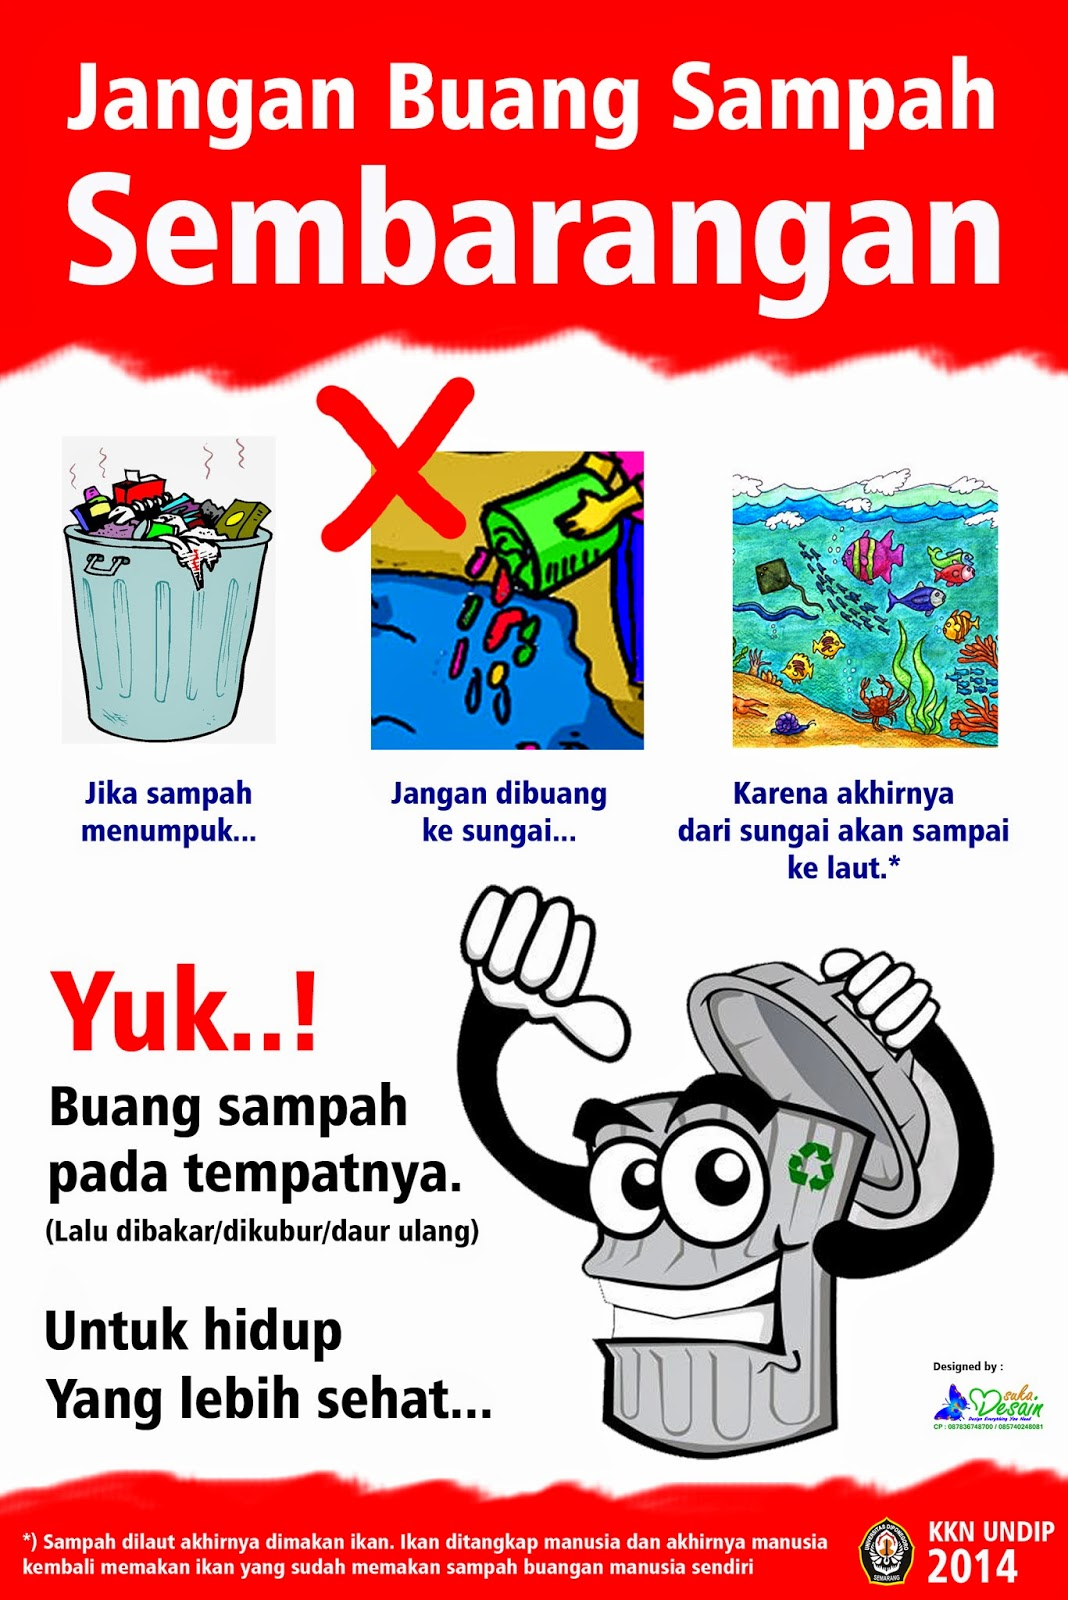 Poster Jangan Buang Sampah Sembarangan - SUKADESAIN